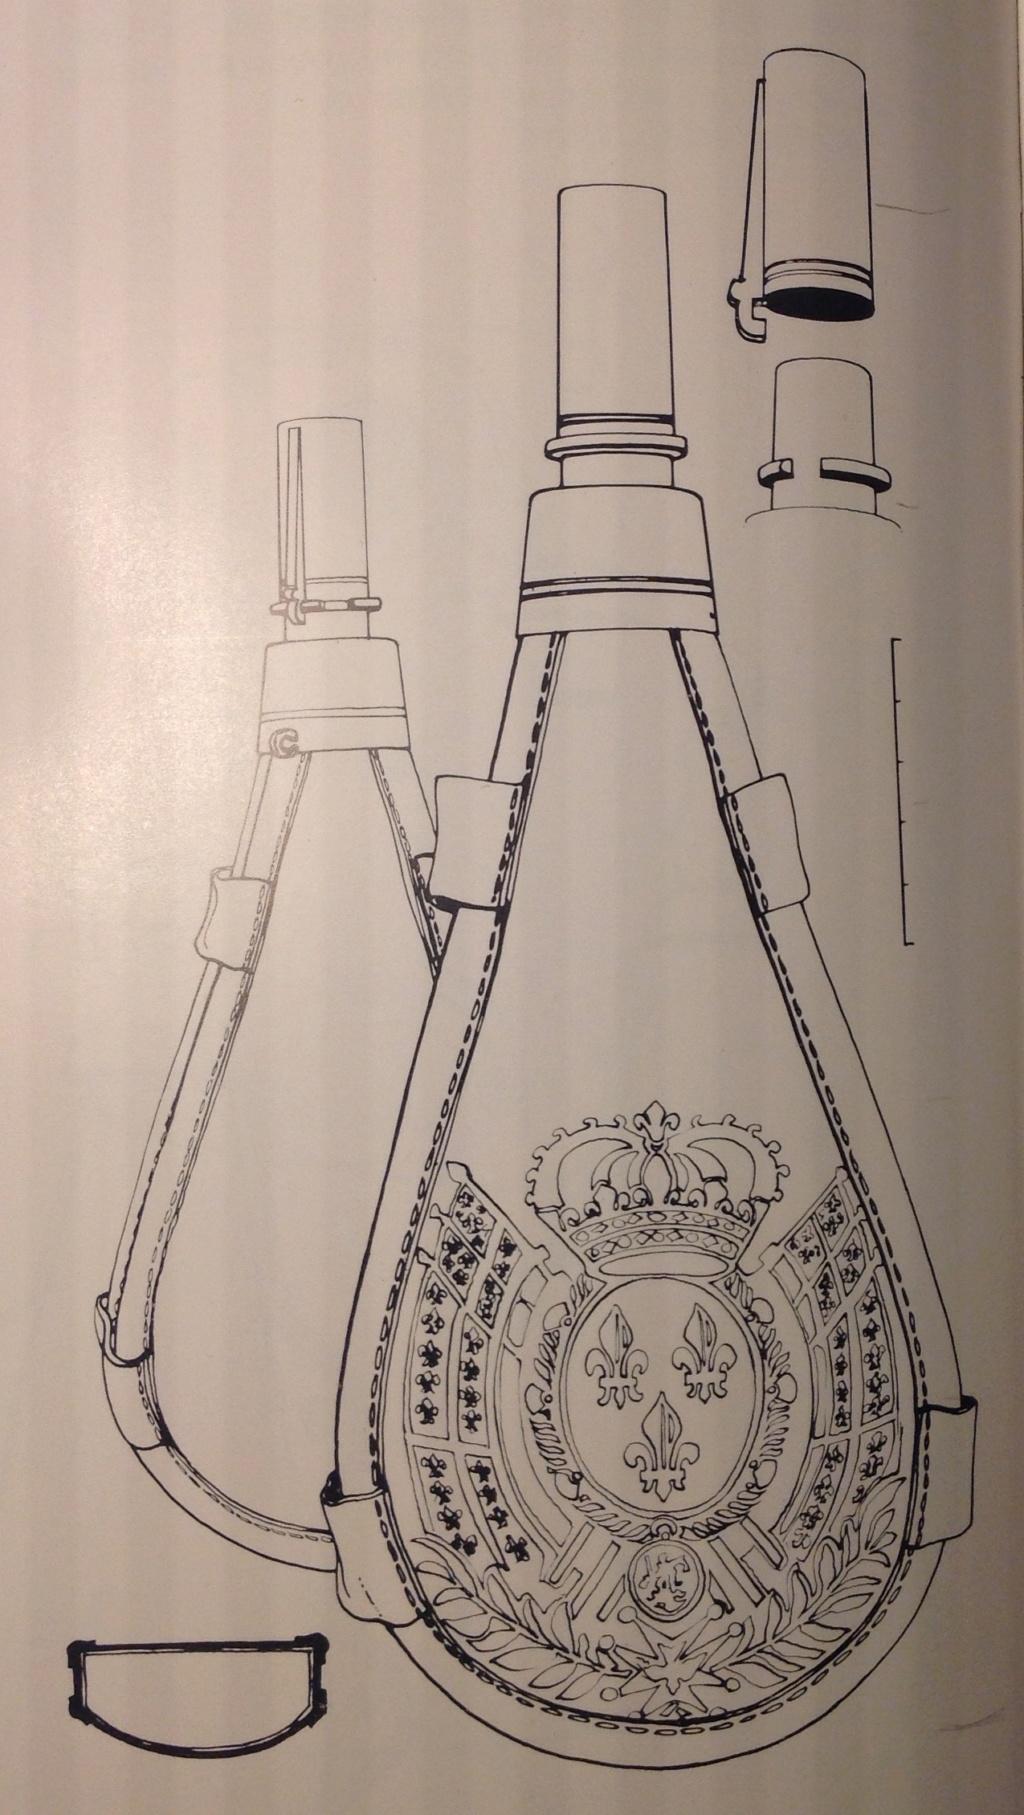 sabres de hussard ancien régime Fullsi10